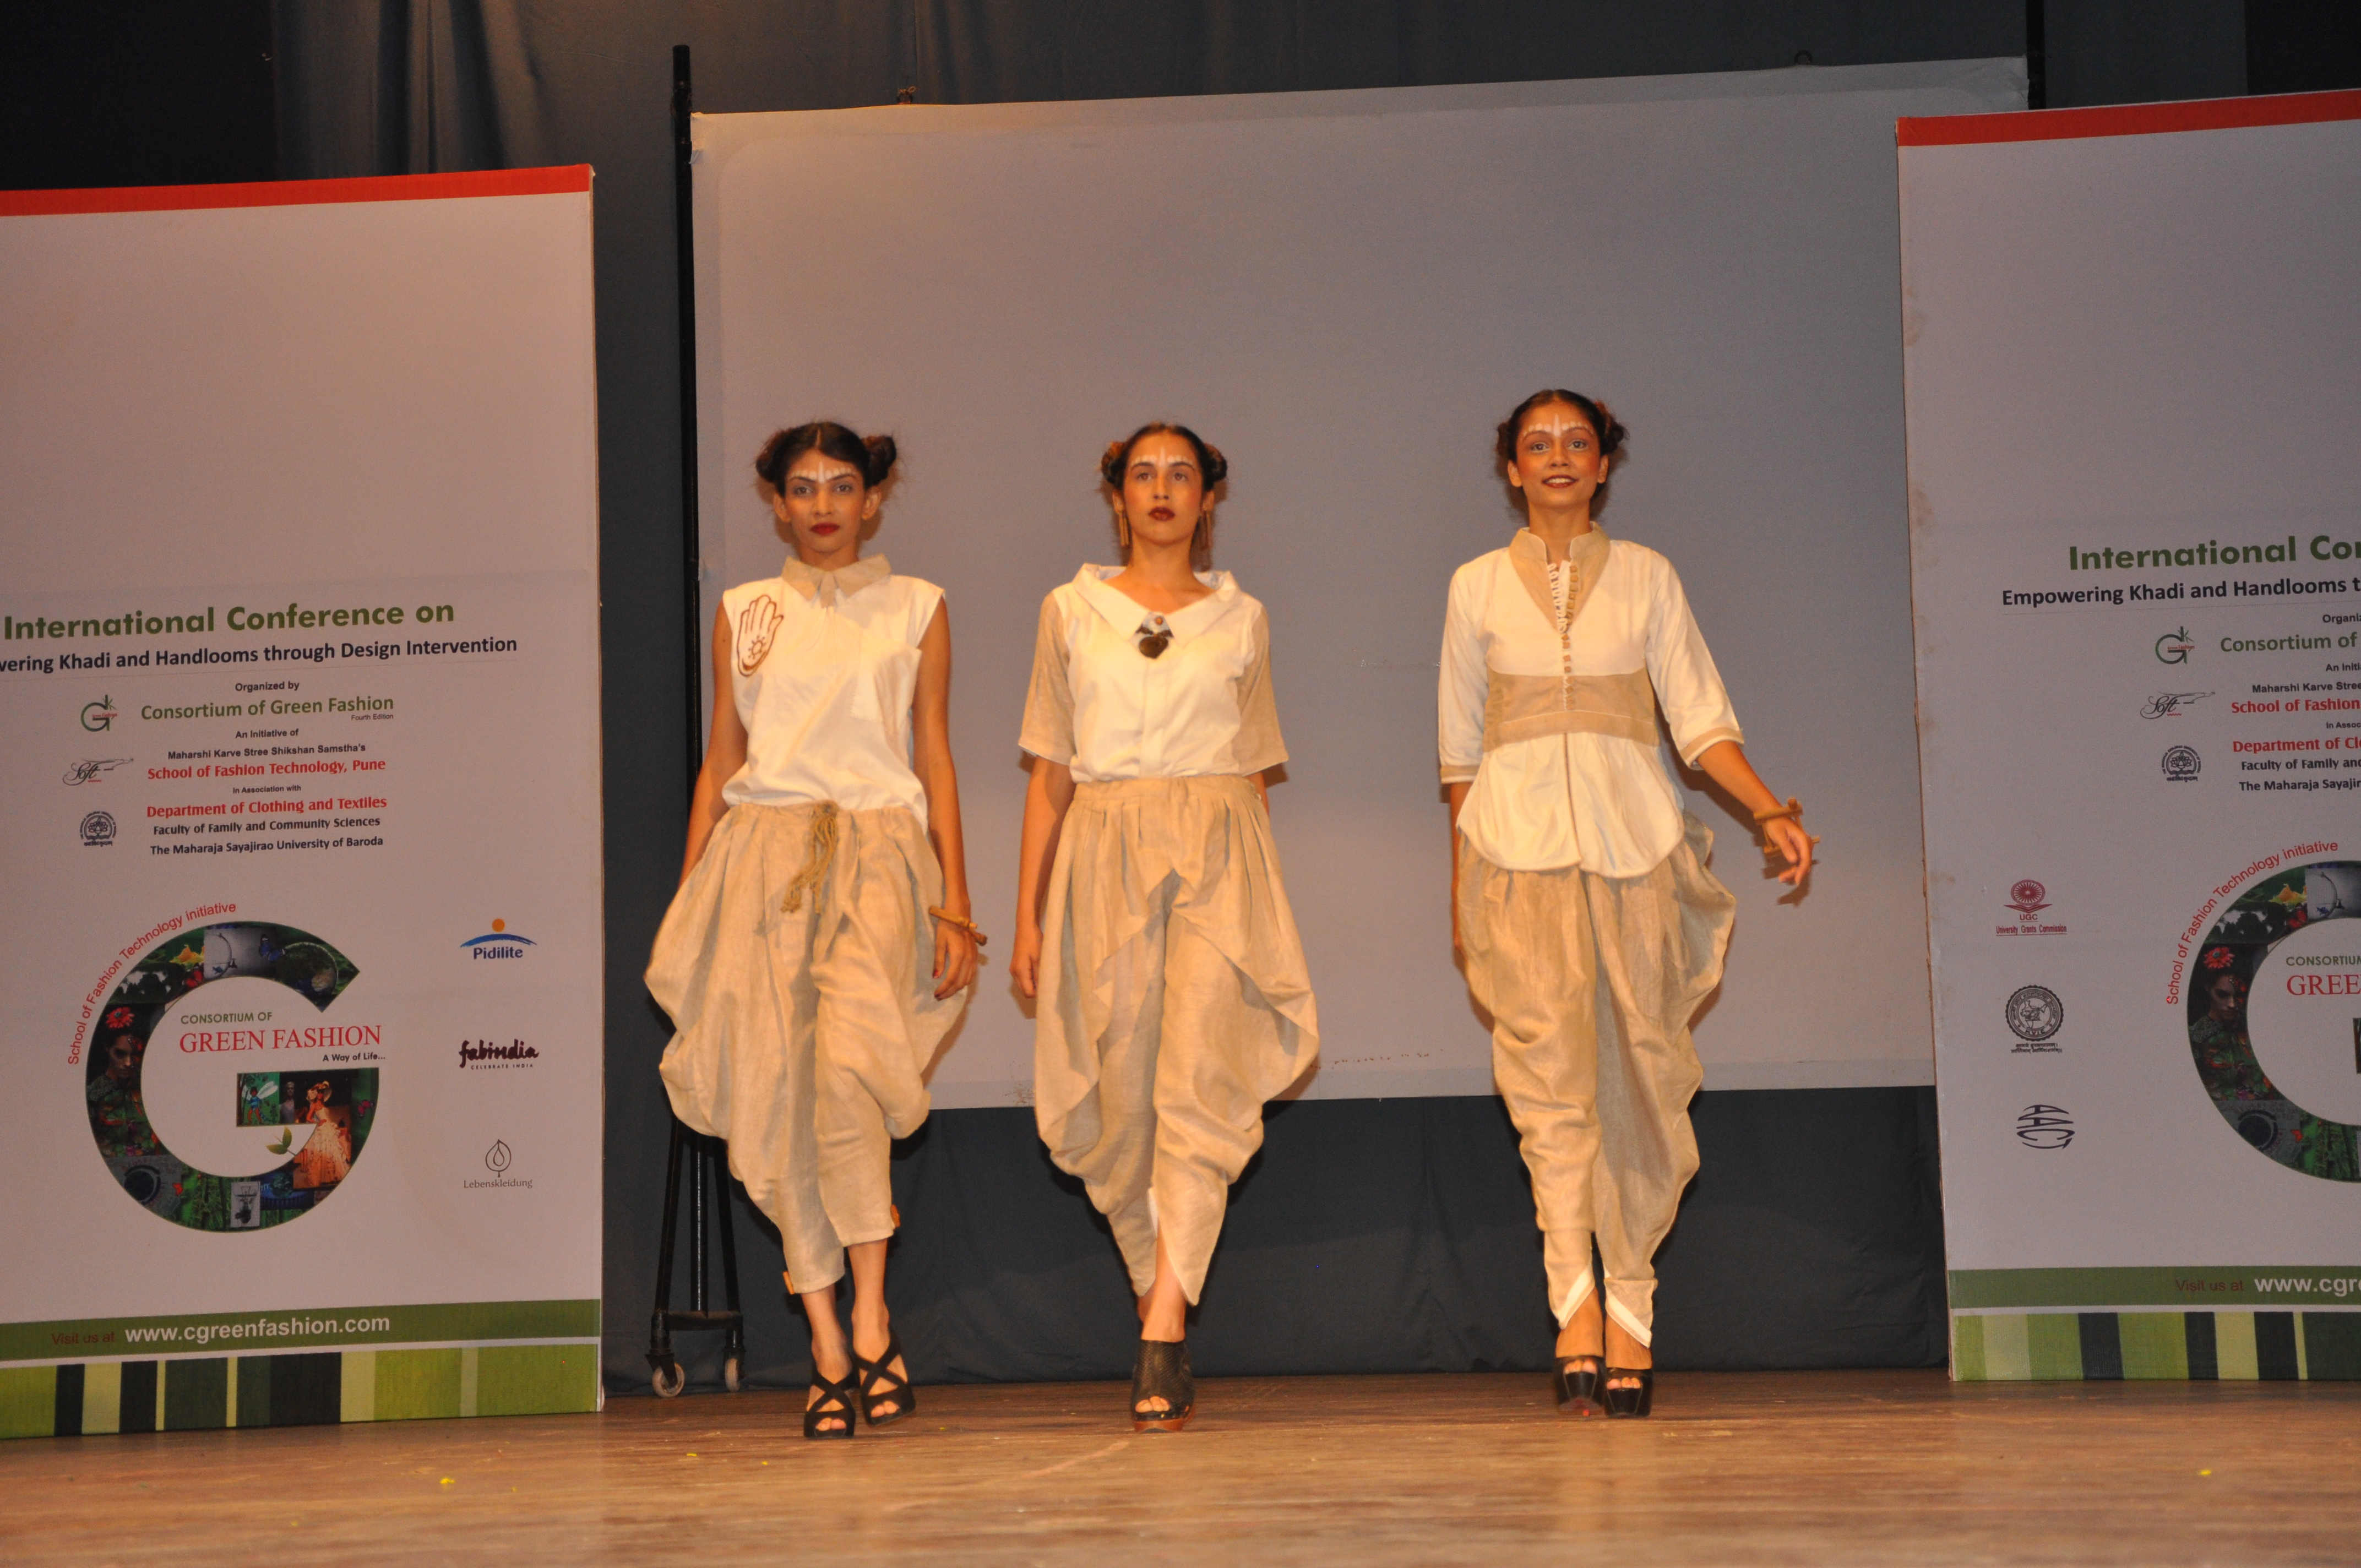 CFG Fashion Show